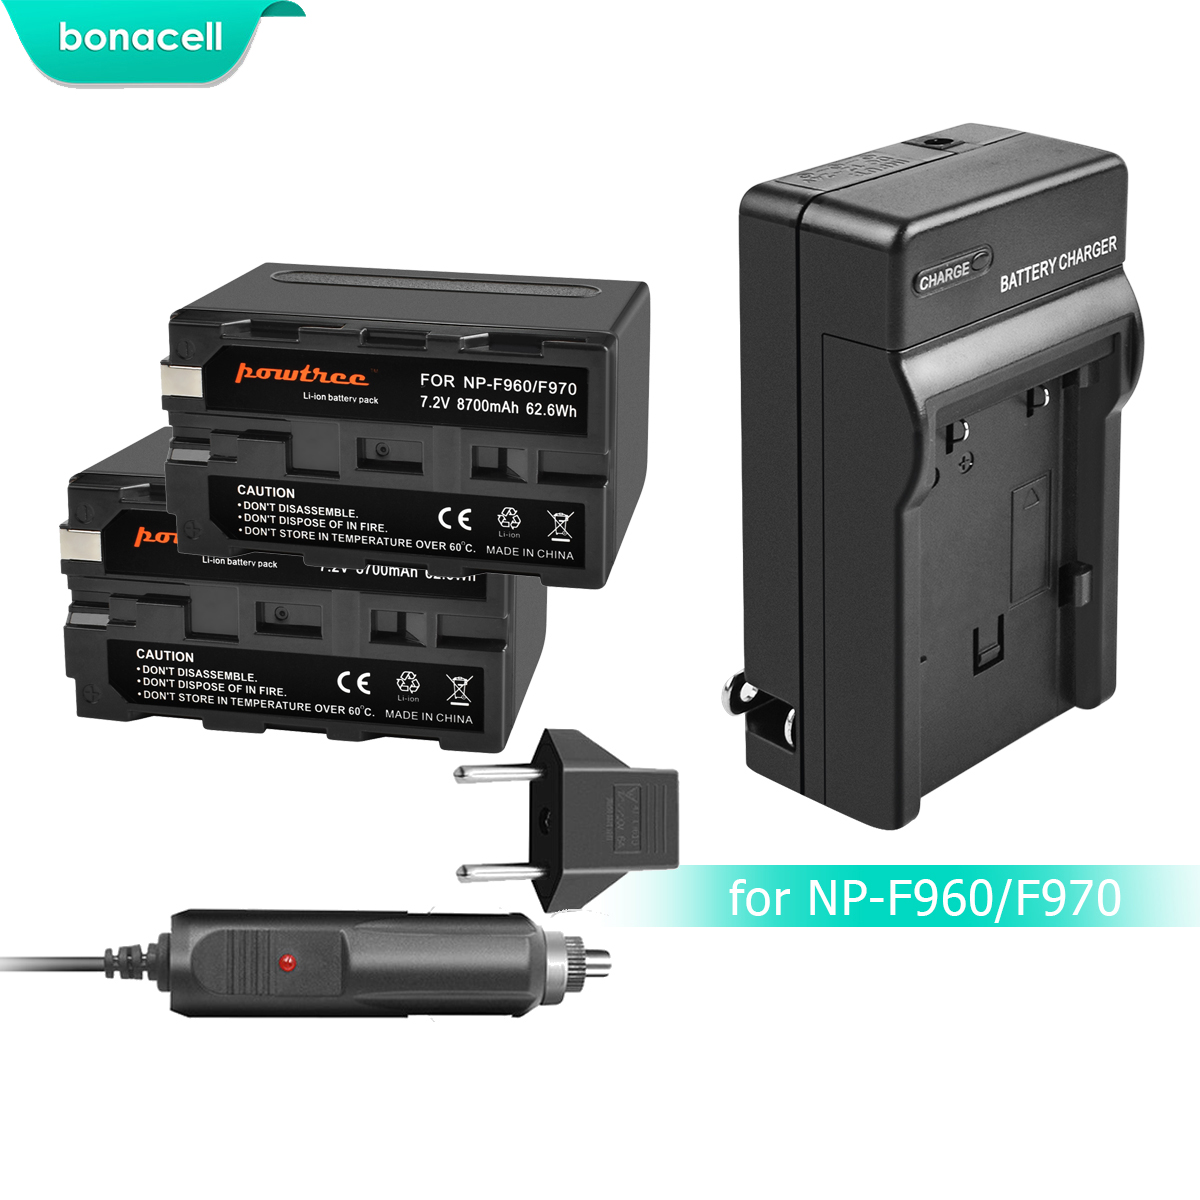 Bonacell 7.2V 8700mAh NP F960 NP F970 NP F960 F970 F950 Battery+Charger For Sony PLM 100 CCD TRV35 MVC FD91 MC1500C L10